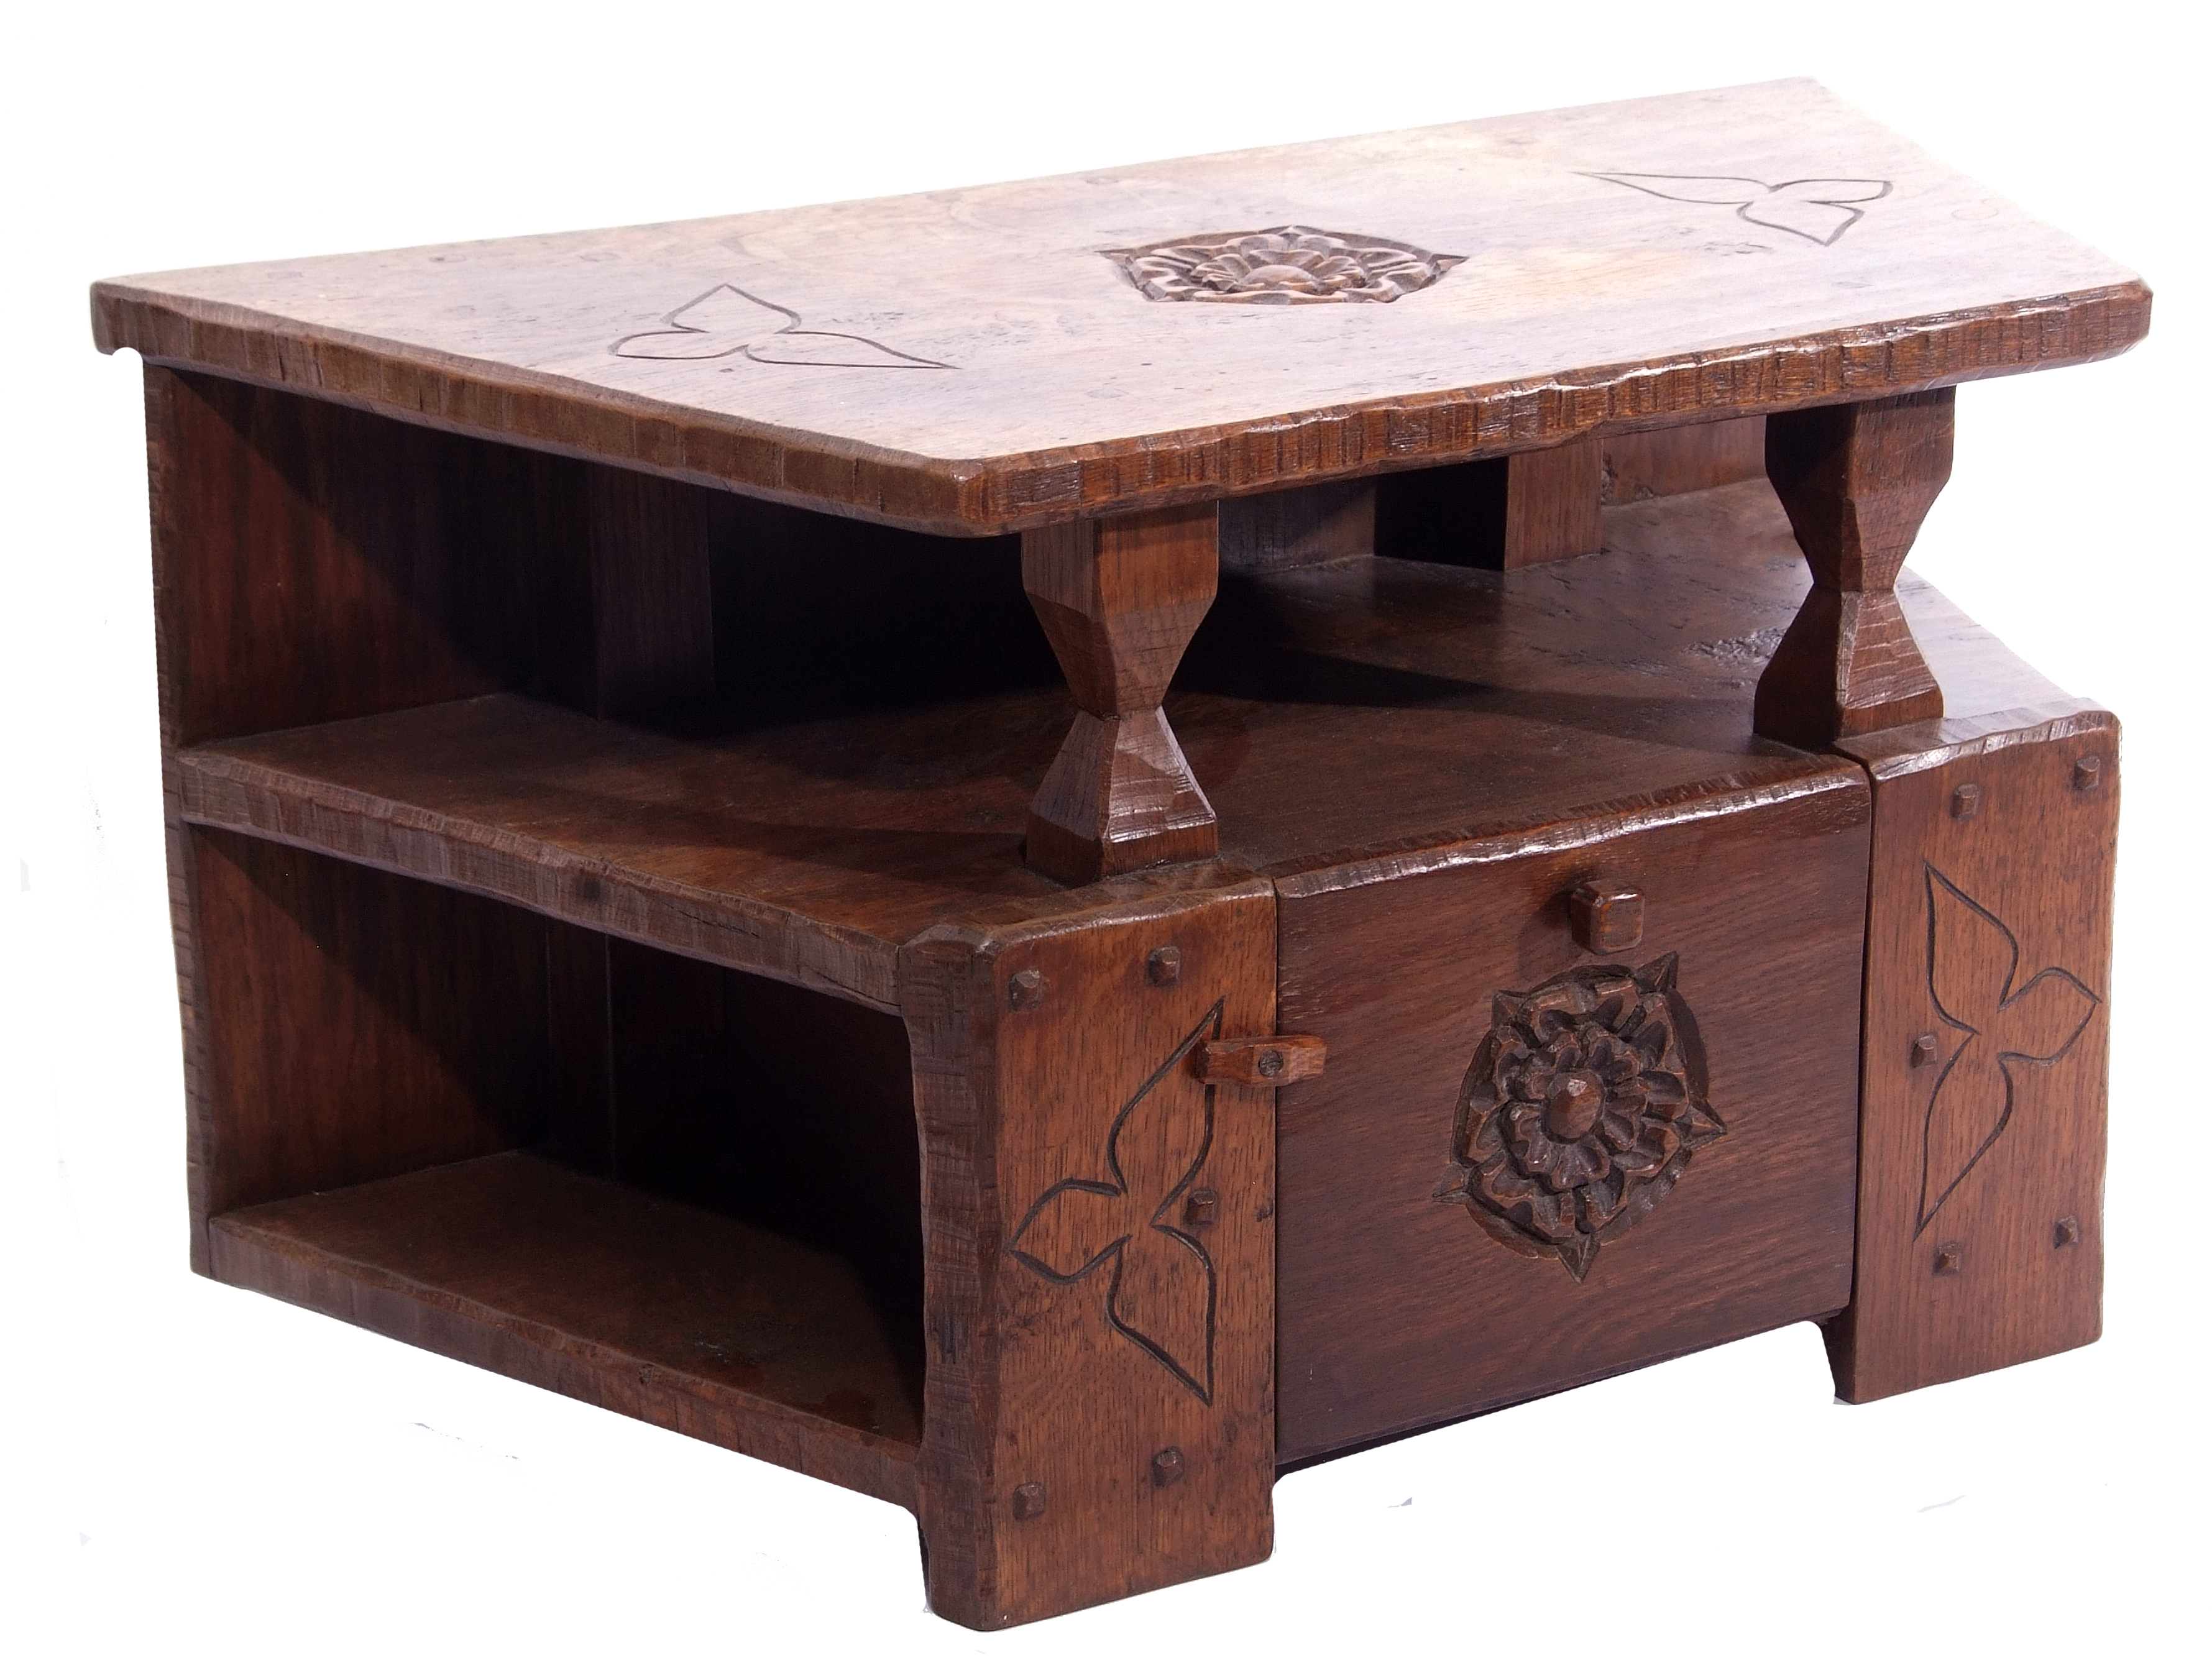 Jack Grimble of Cromer, a small oak losenge shaped side table with carved Tudor Rose detail 76cm - Image 2 of 10